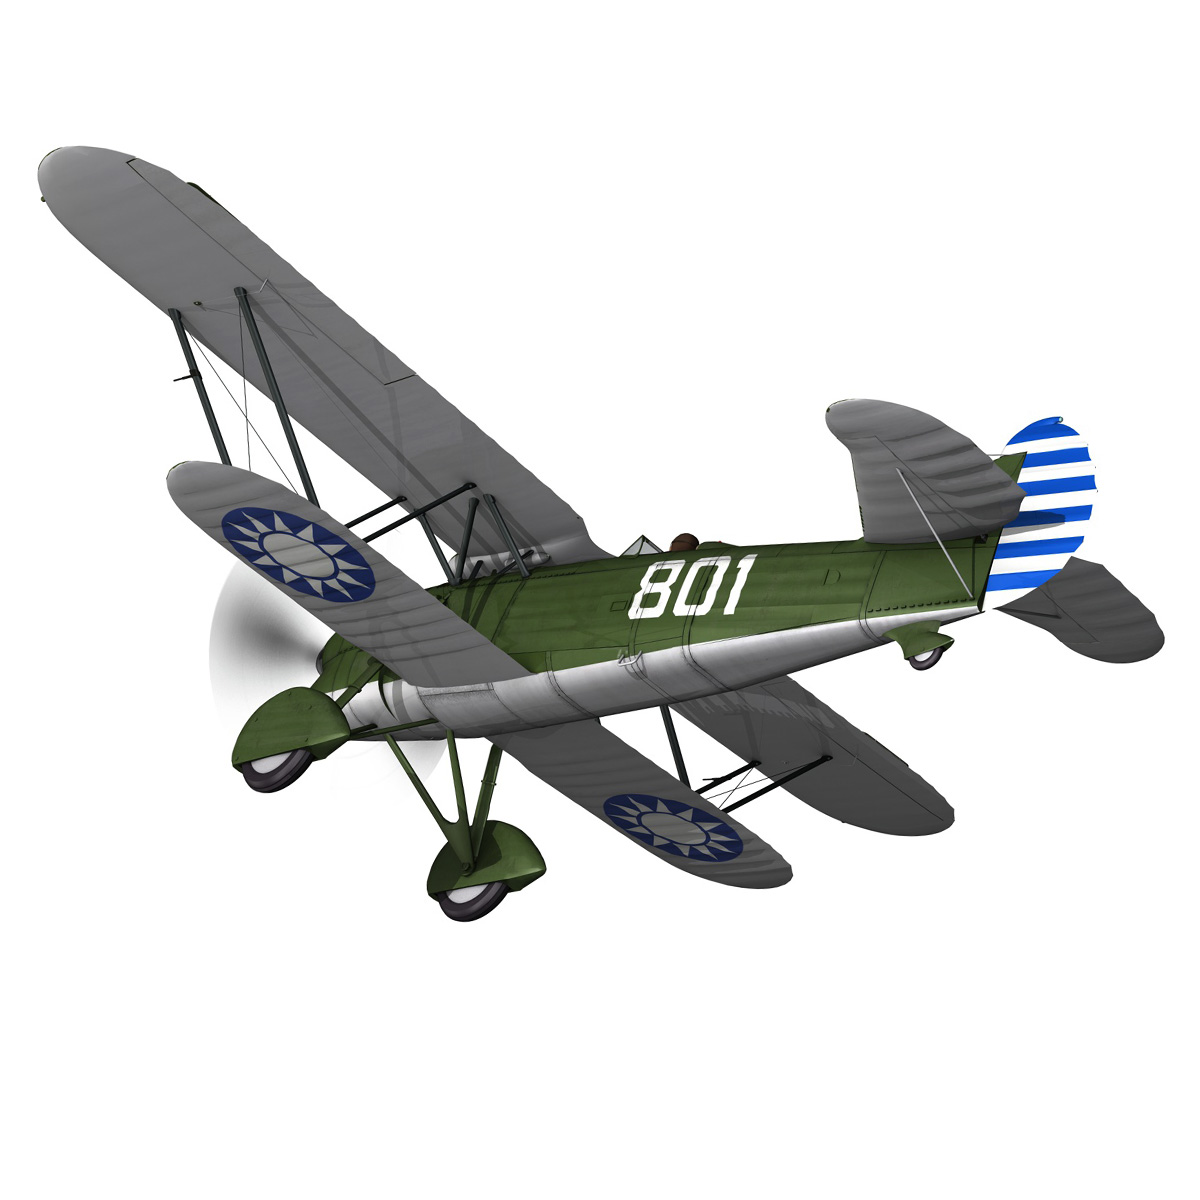 fiat cr.32 – chinese nationalist air force 3d model fbx c4d lwo obj 272631